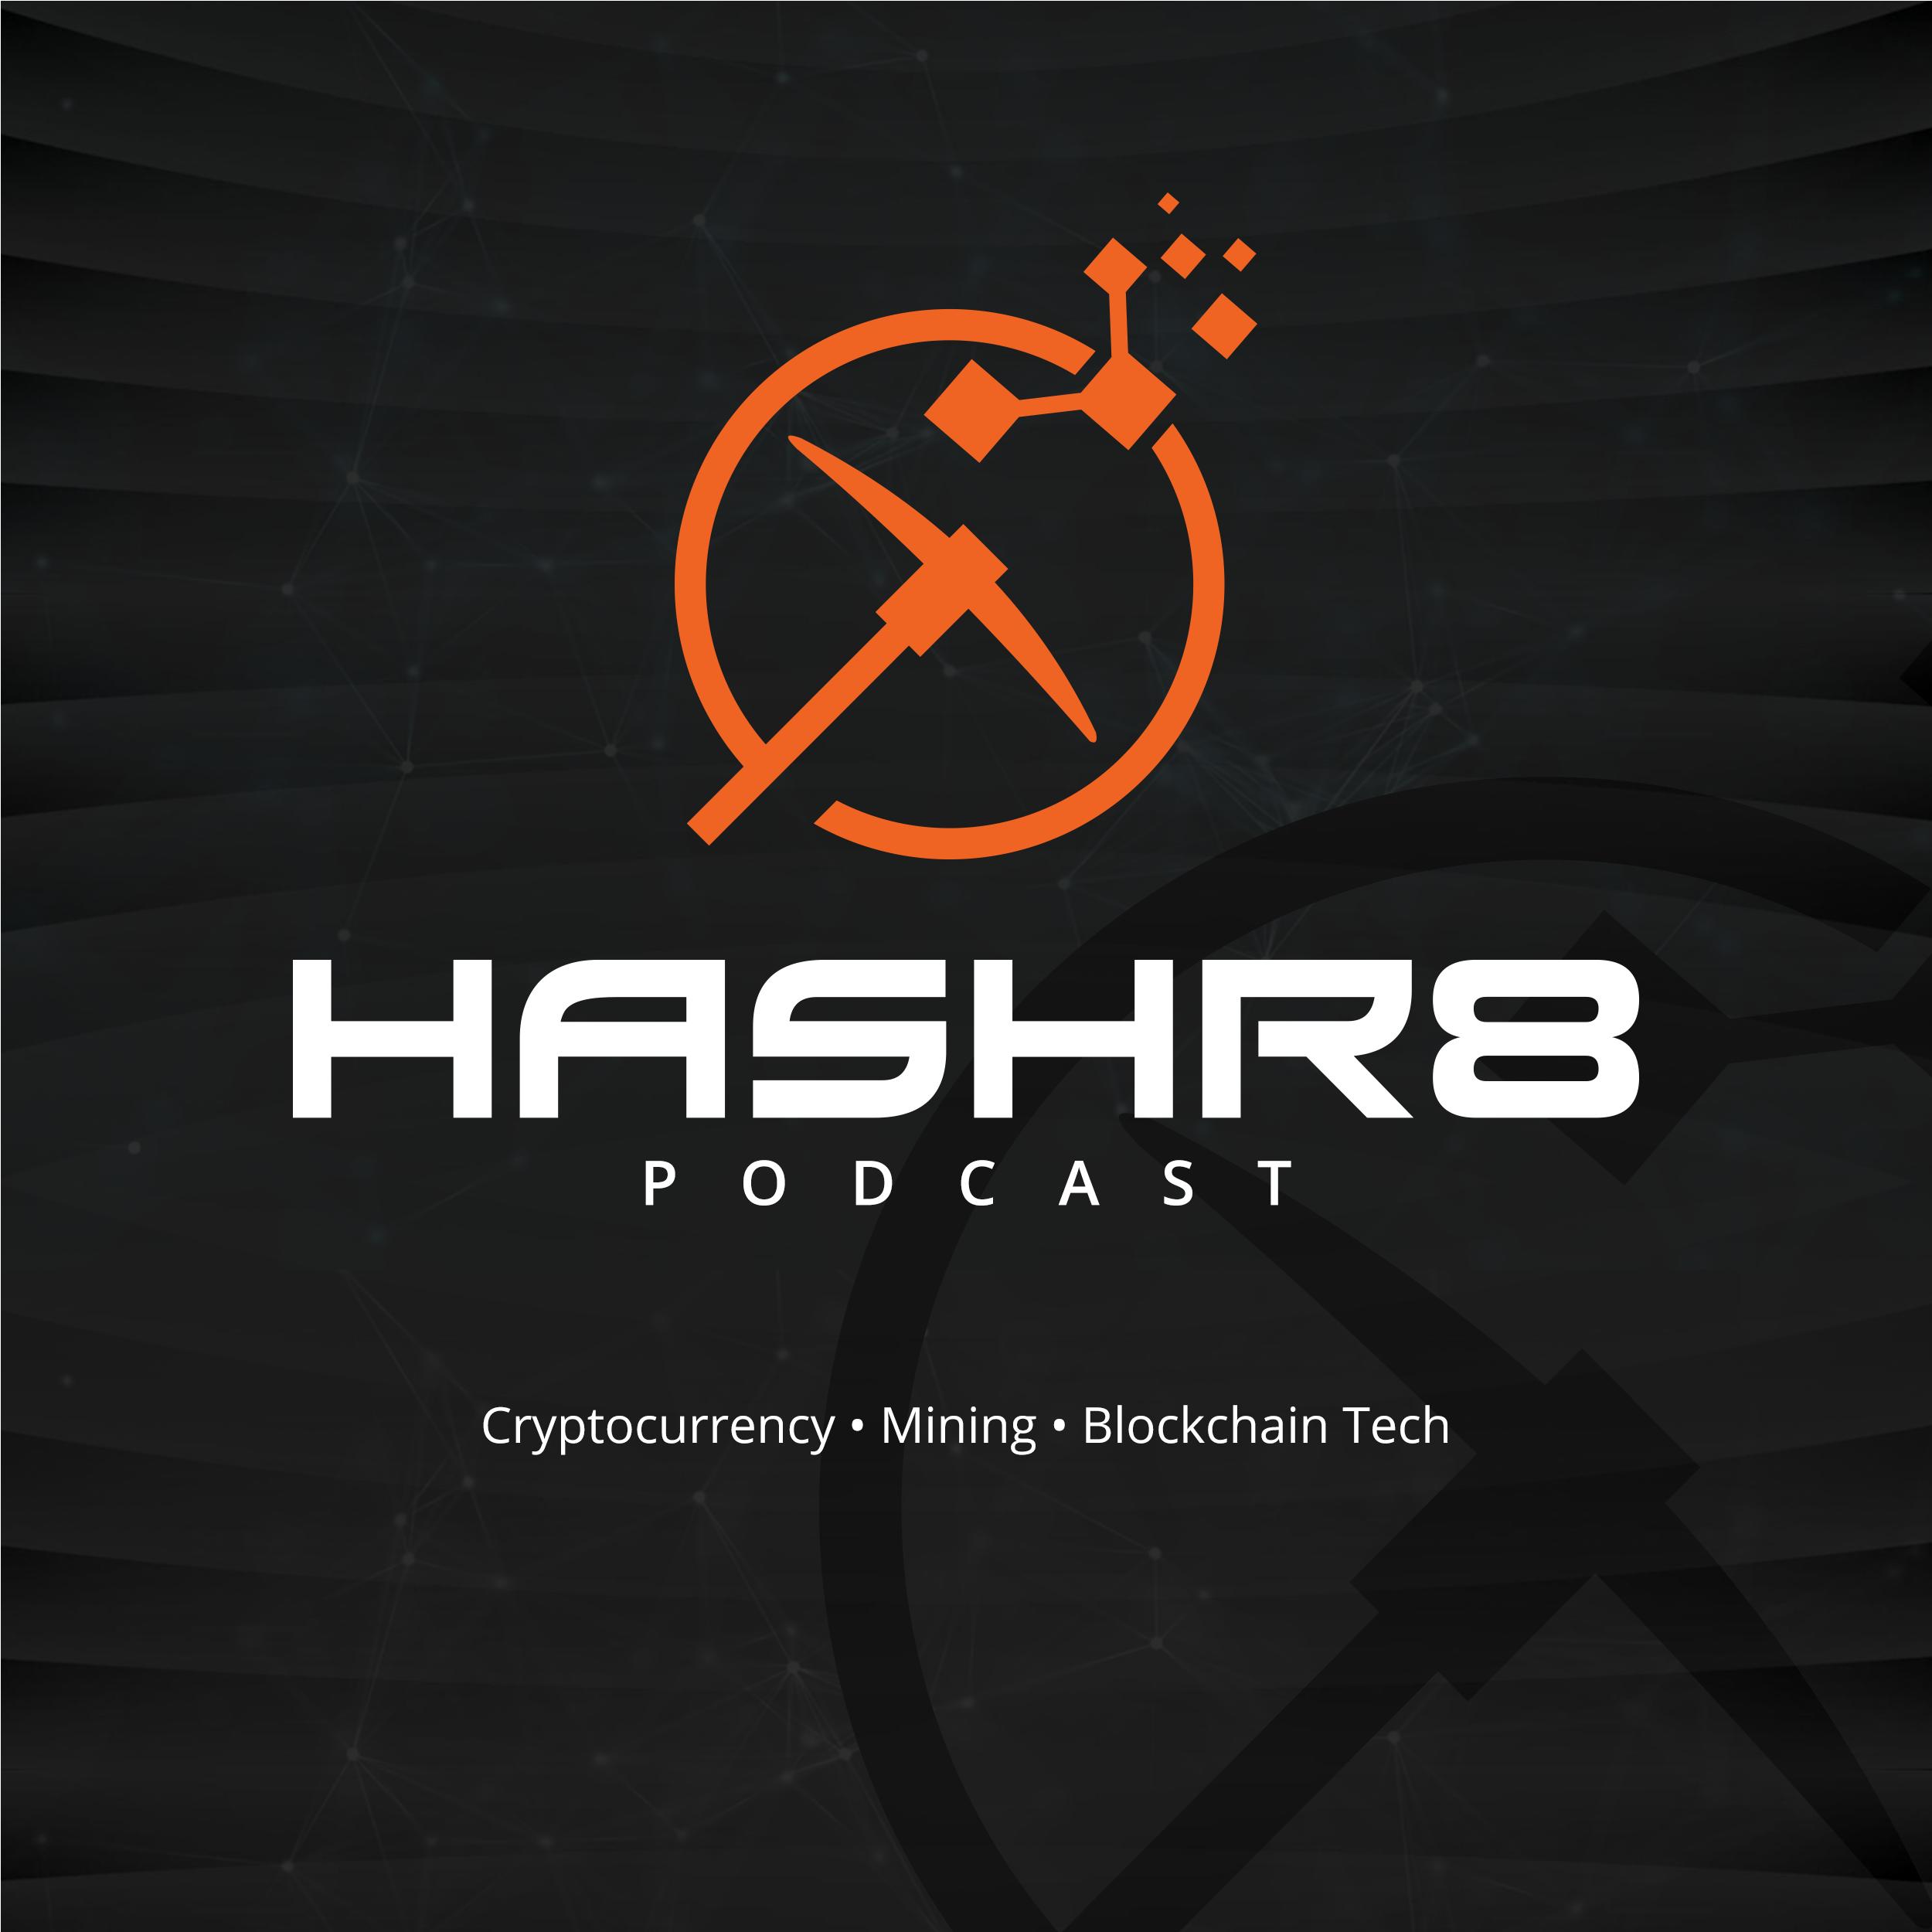 Hashr8 Podcast show art